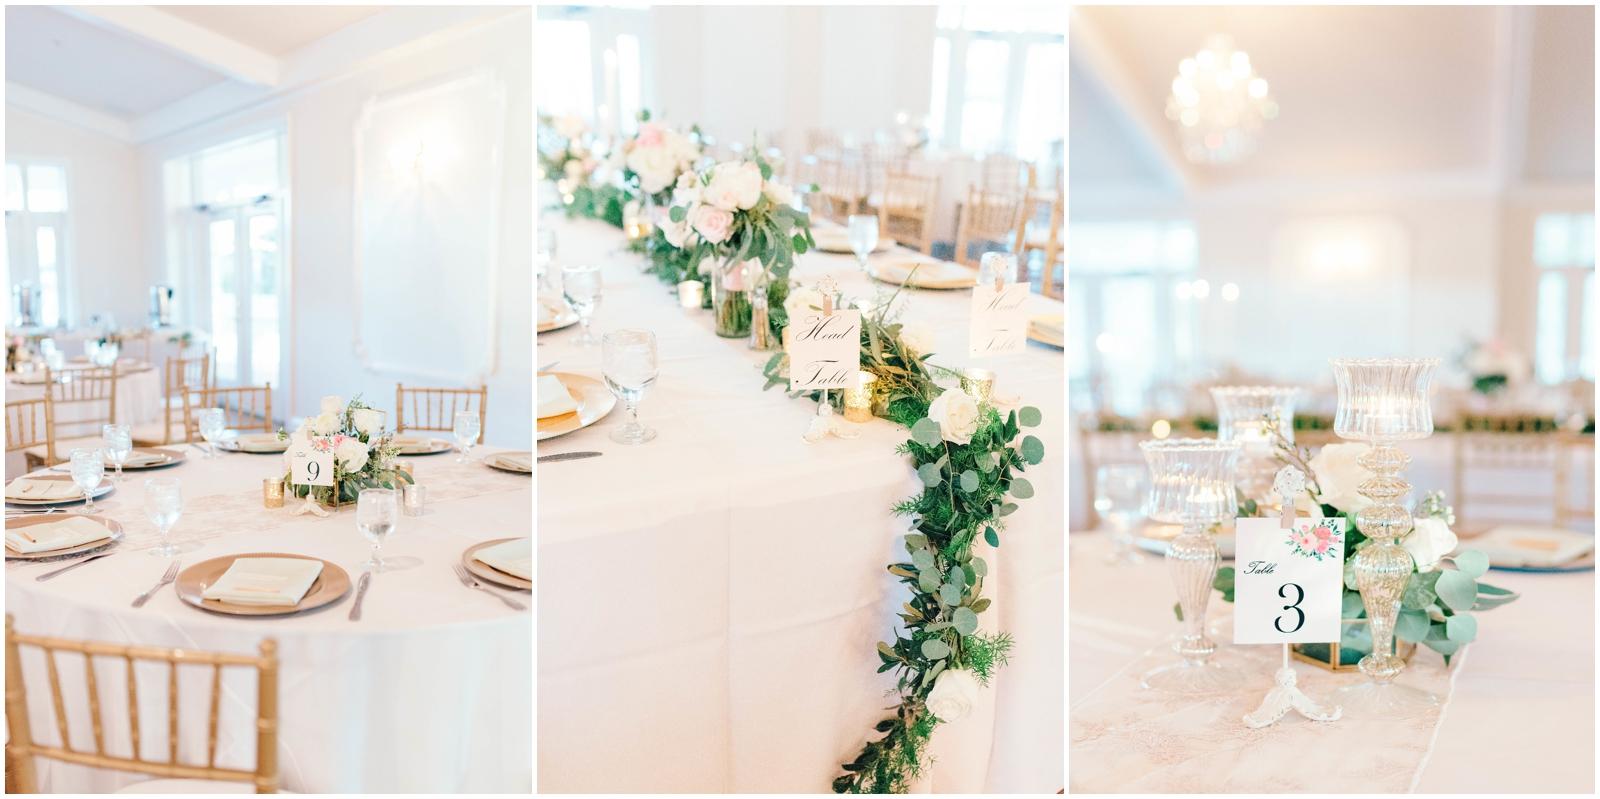 Tampa Area Wedding Venue with Southern Charm- Stonebridge Events_0287.jpg